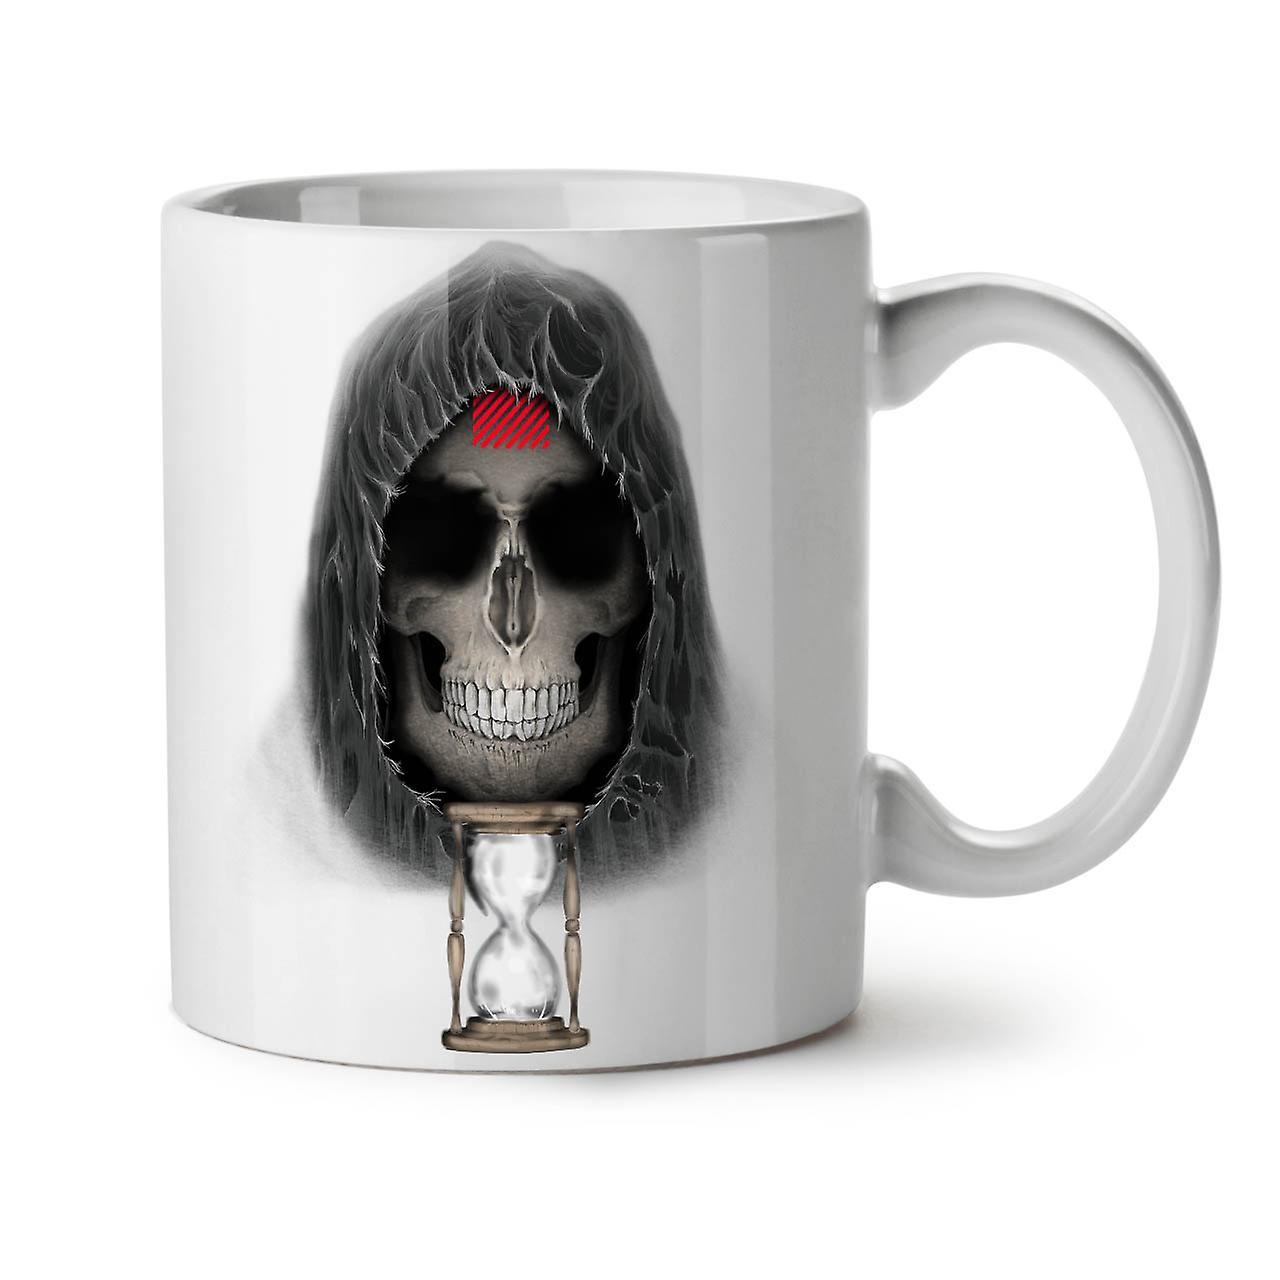 Blanc Tasse Café OzWellcoda Thé Métal Céramique 11 Horloge Skull Mort Nouveau WH92YIbeED